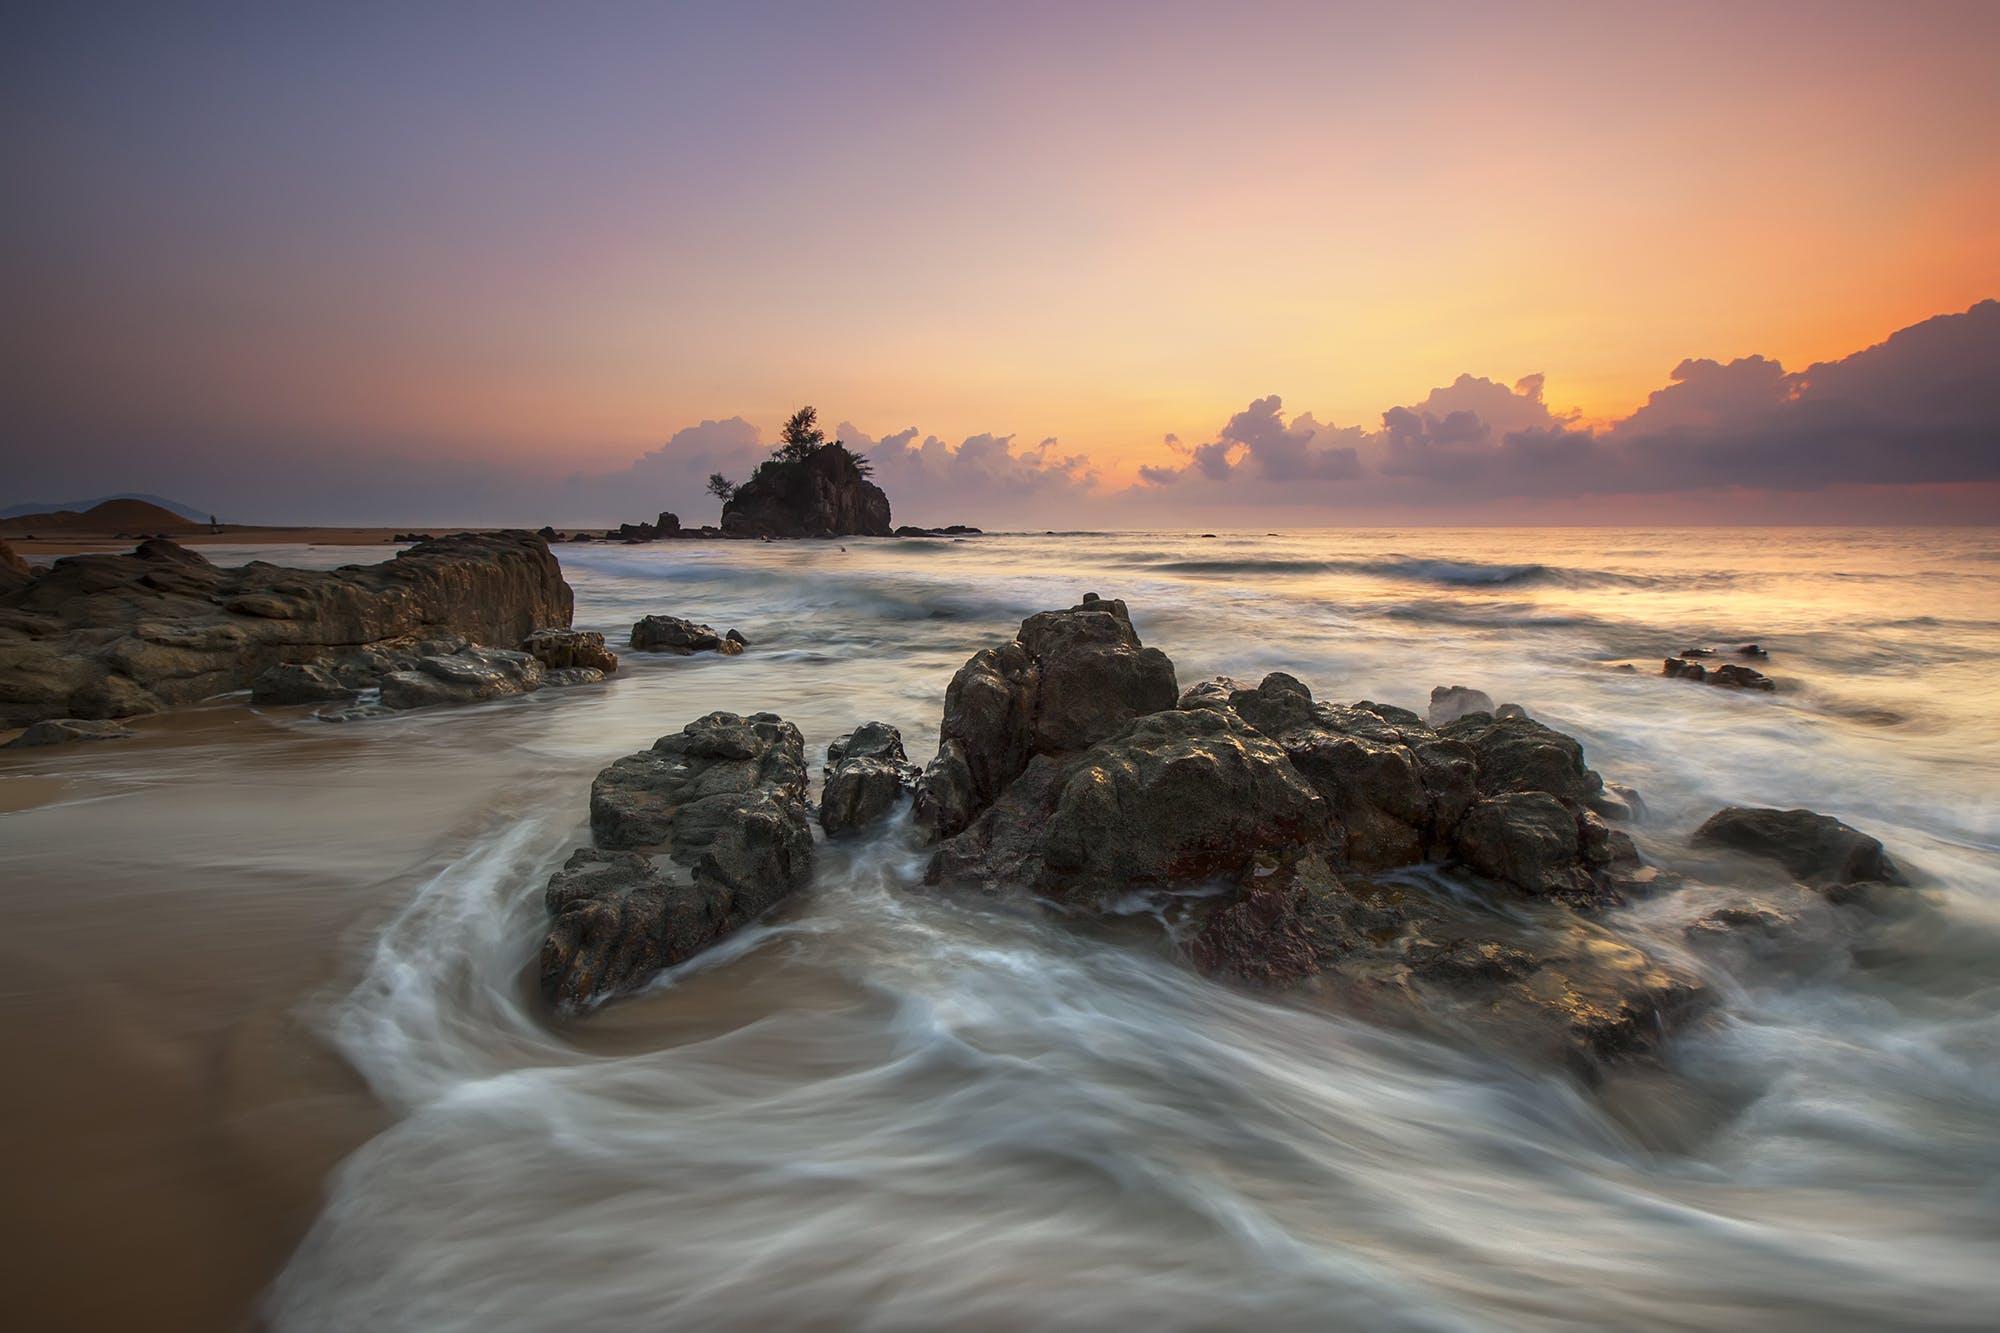 Stone in Seashore during Sunset